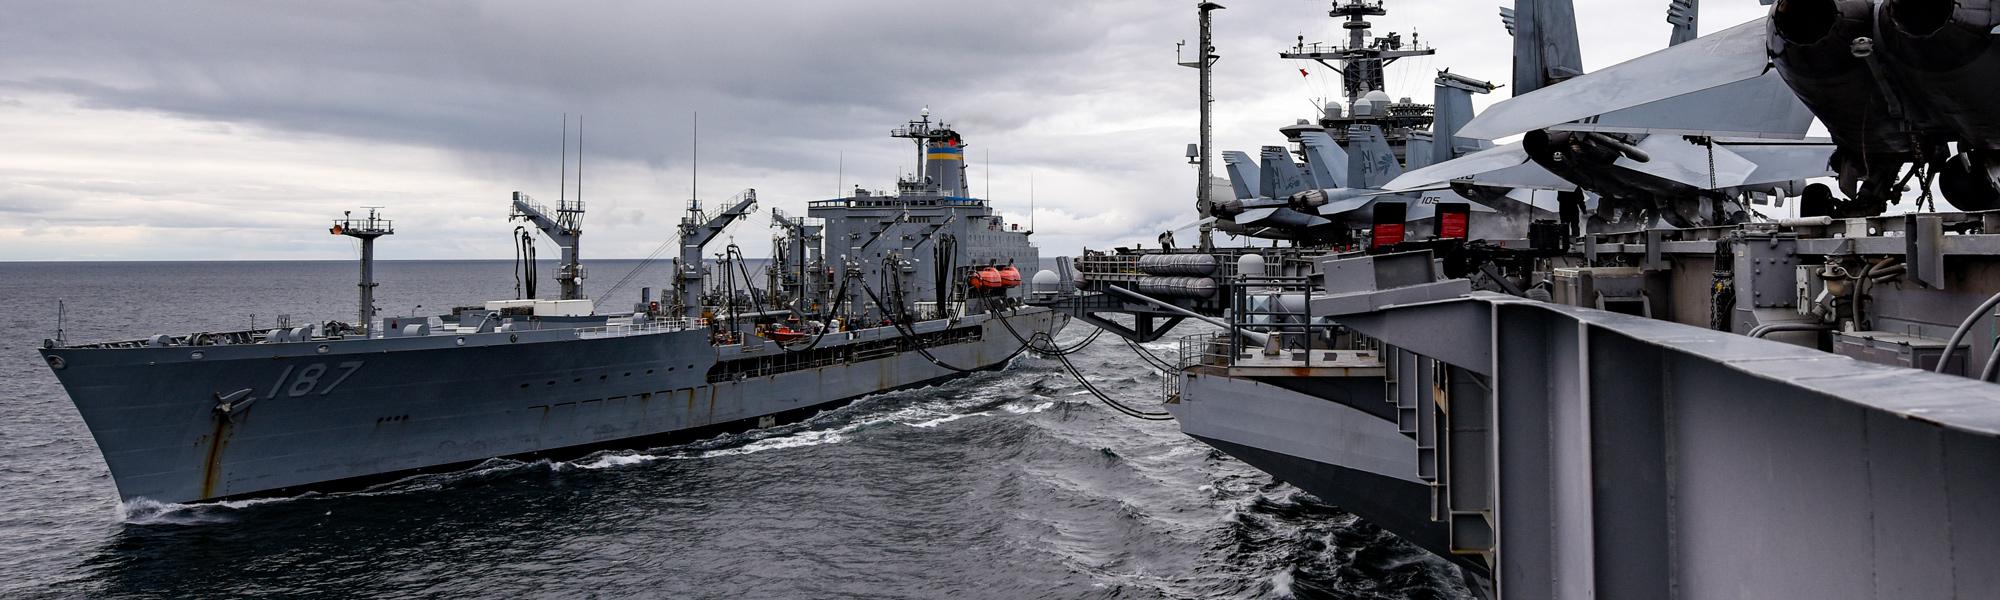 Navel Image - Resupply Ship